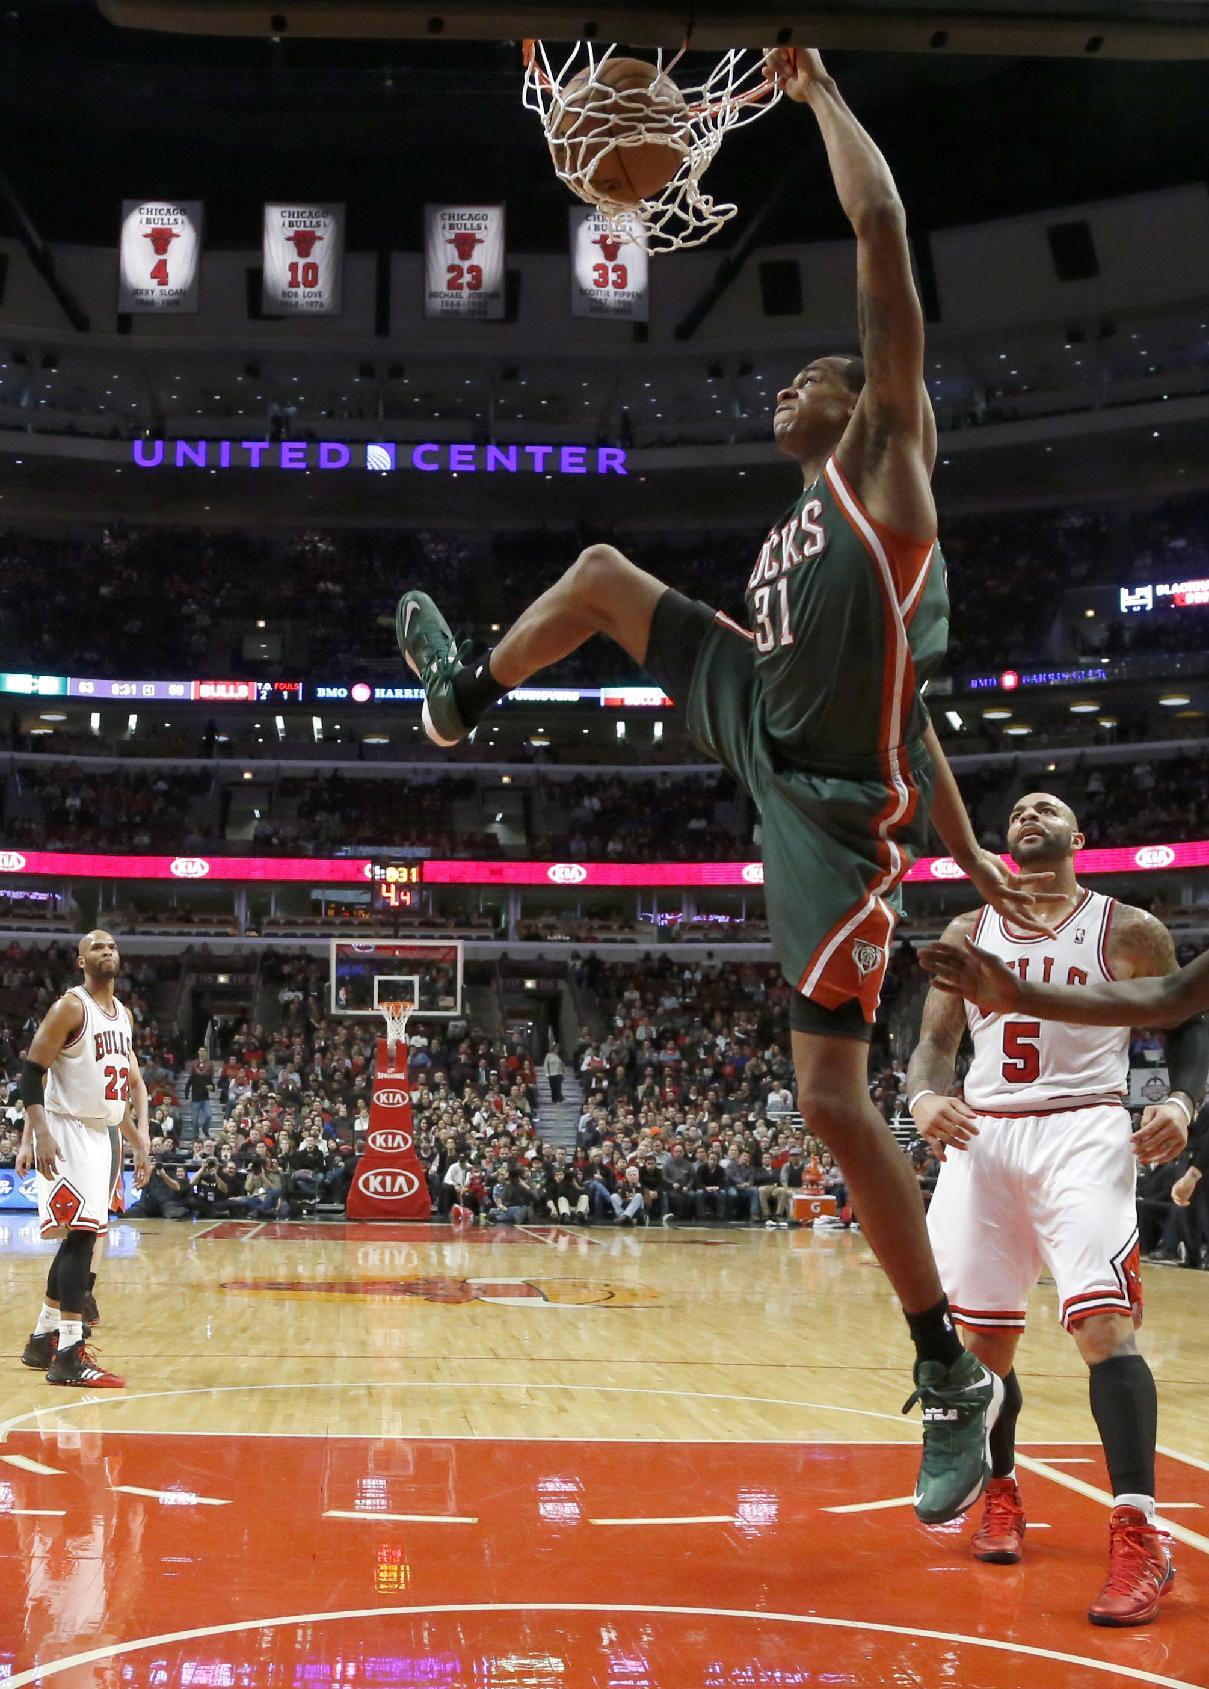 Milwaukee Bucks power forward John Henson (31) dunks the ball past Chicago Bulls power forward Carlos Boozer (5) during the second half of an NBA basketball game Tuesday, Dec. 10, 2013, in Chicago. The Bucks won 78-74